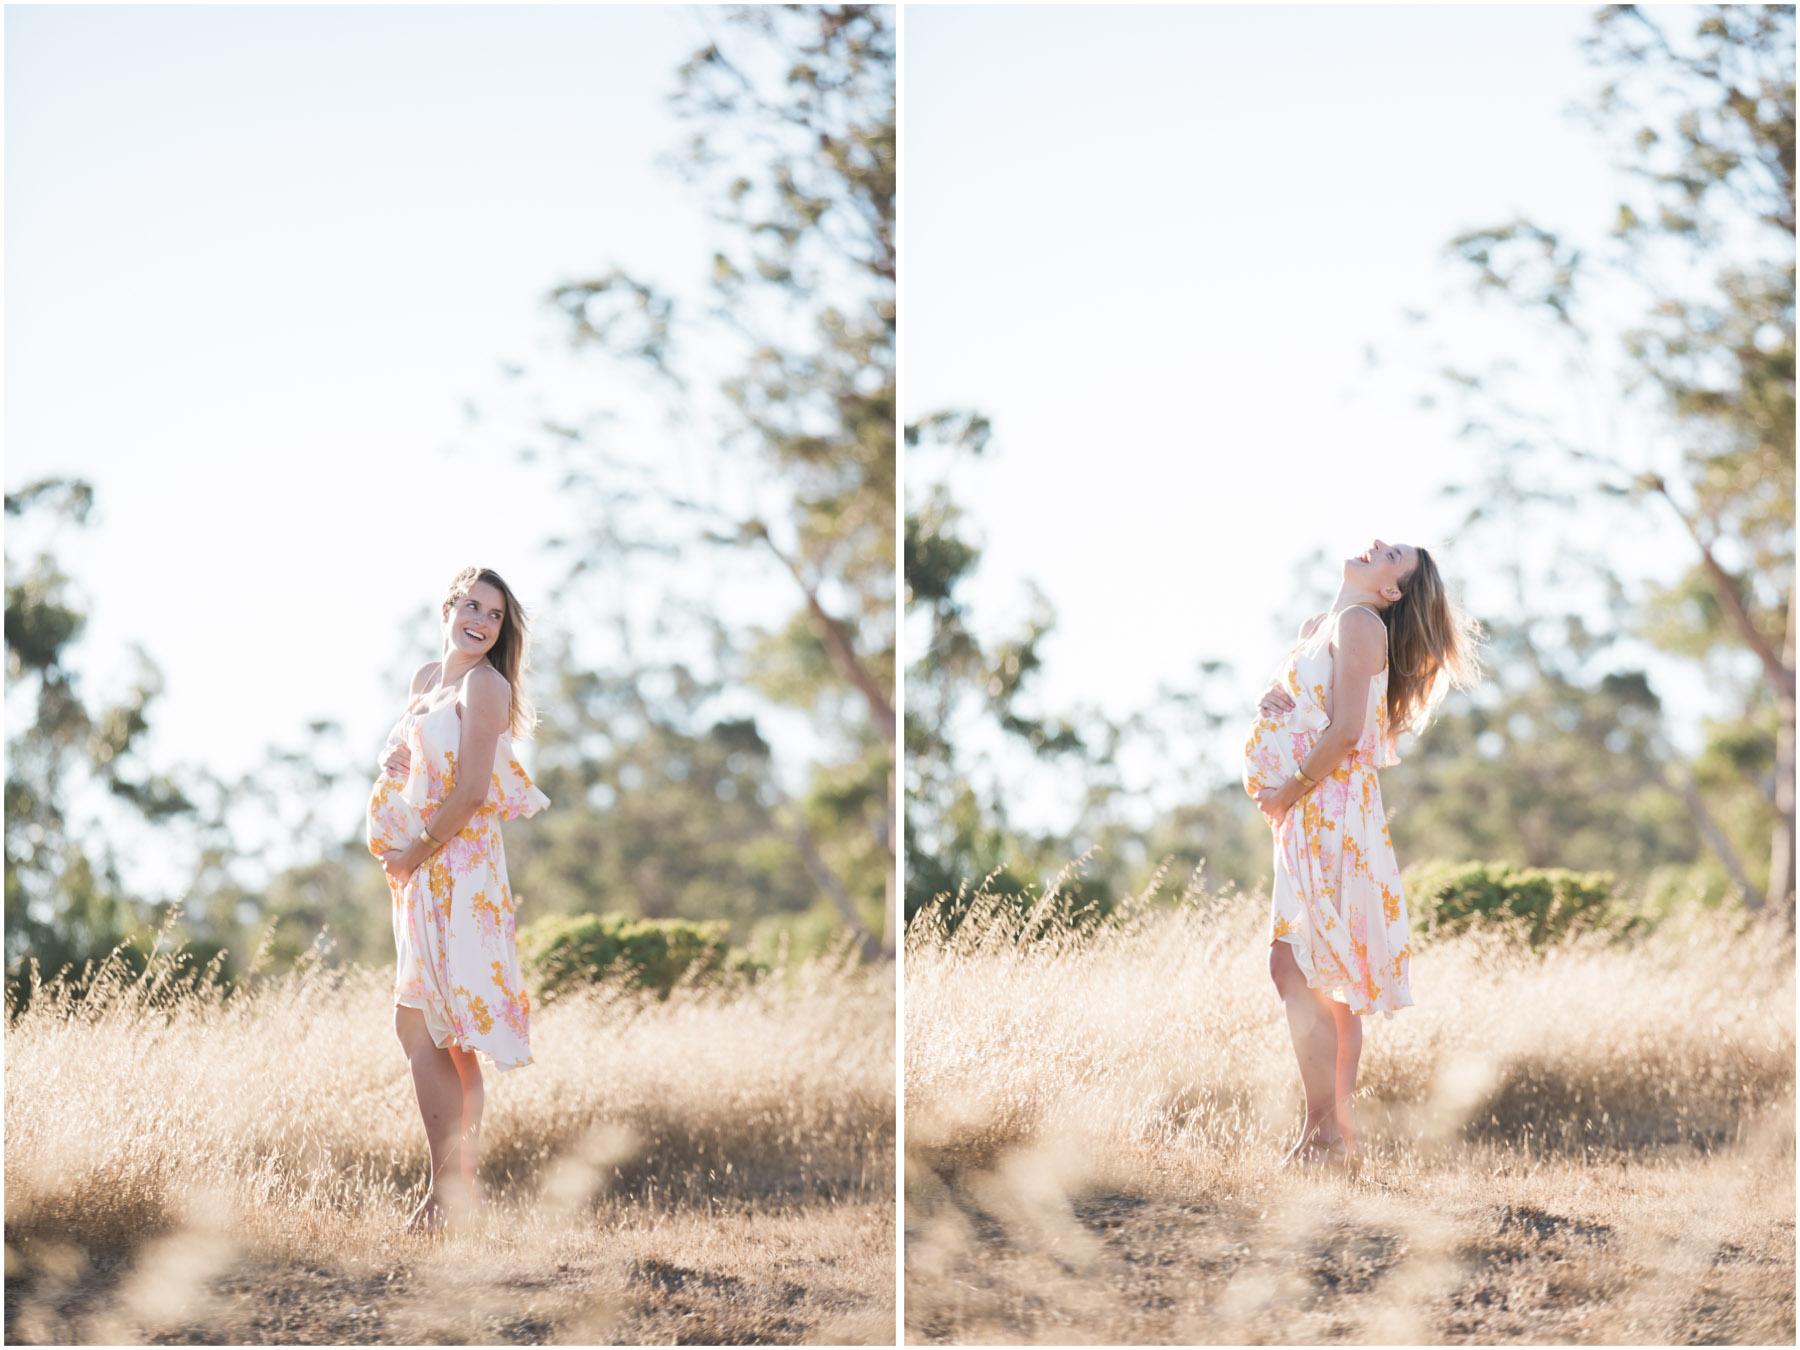 JennaBethPhotography-HumphreyMat-10.jpg